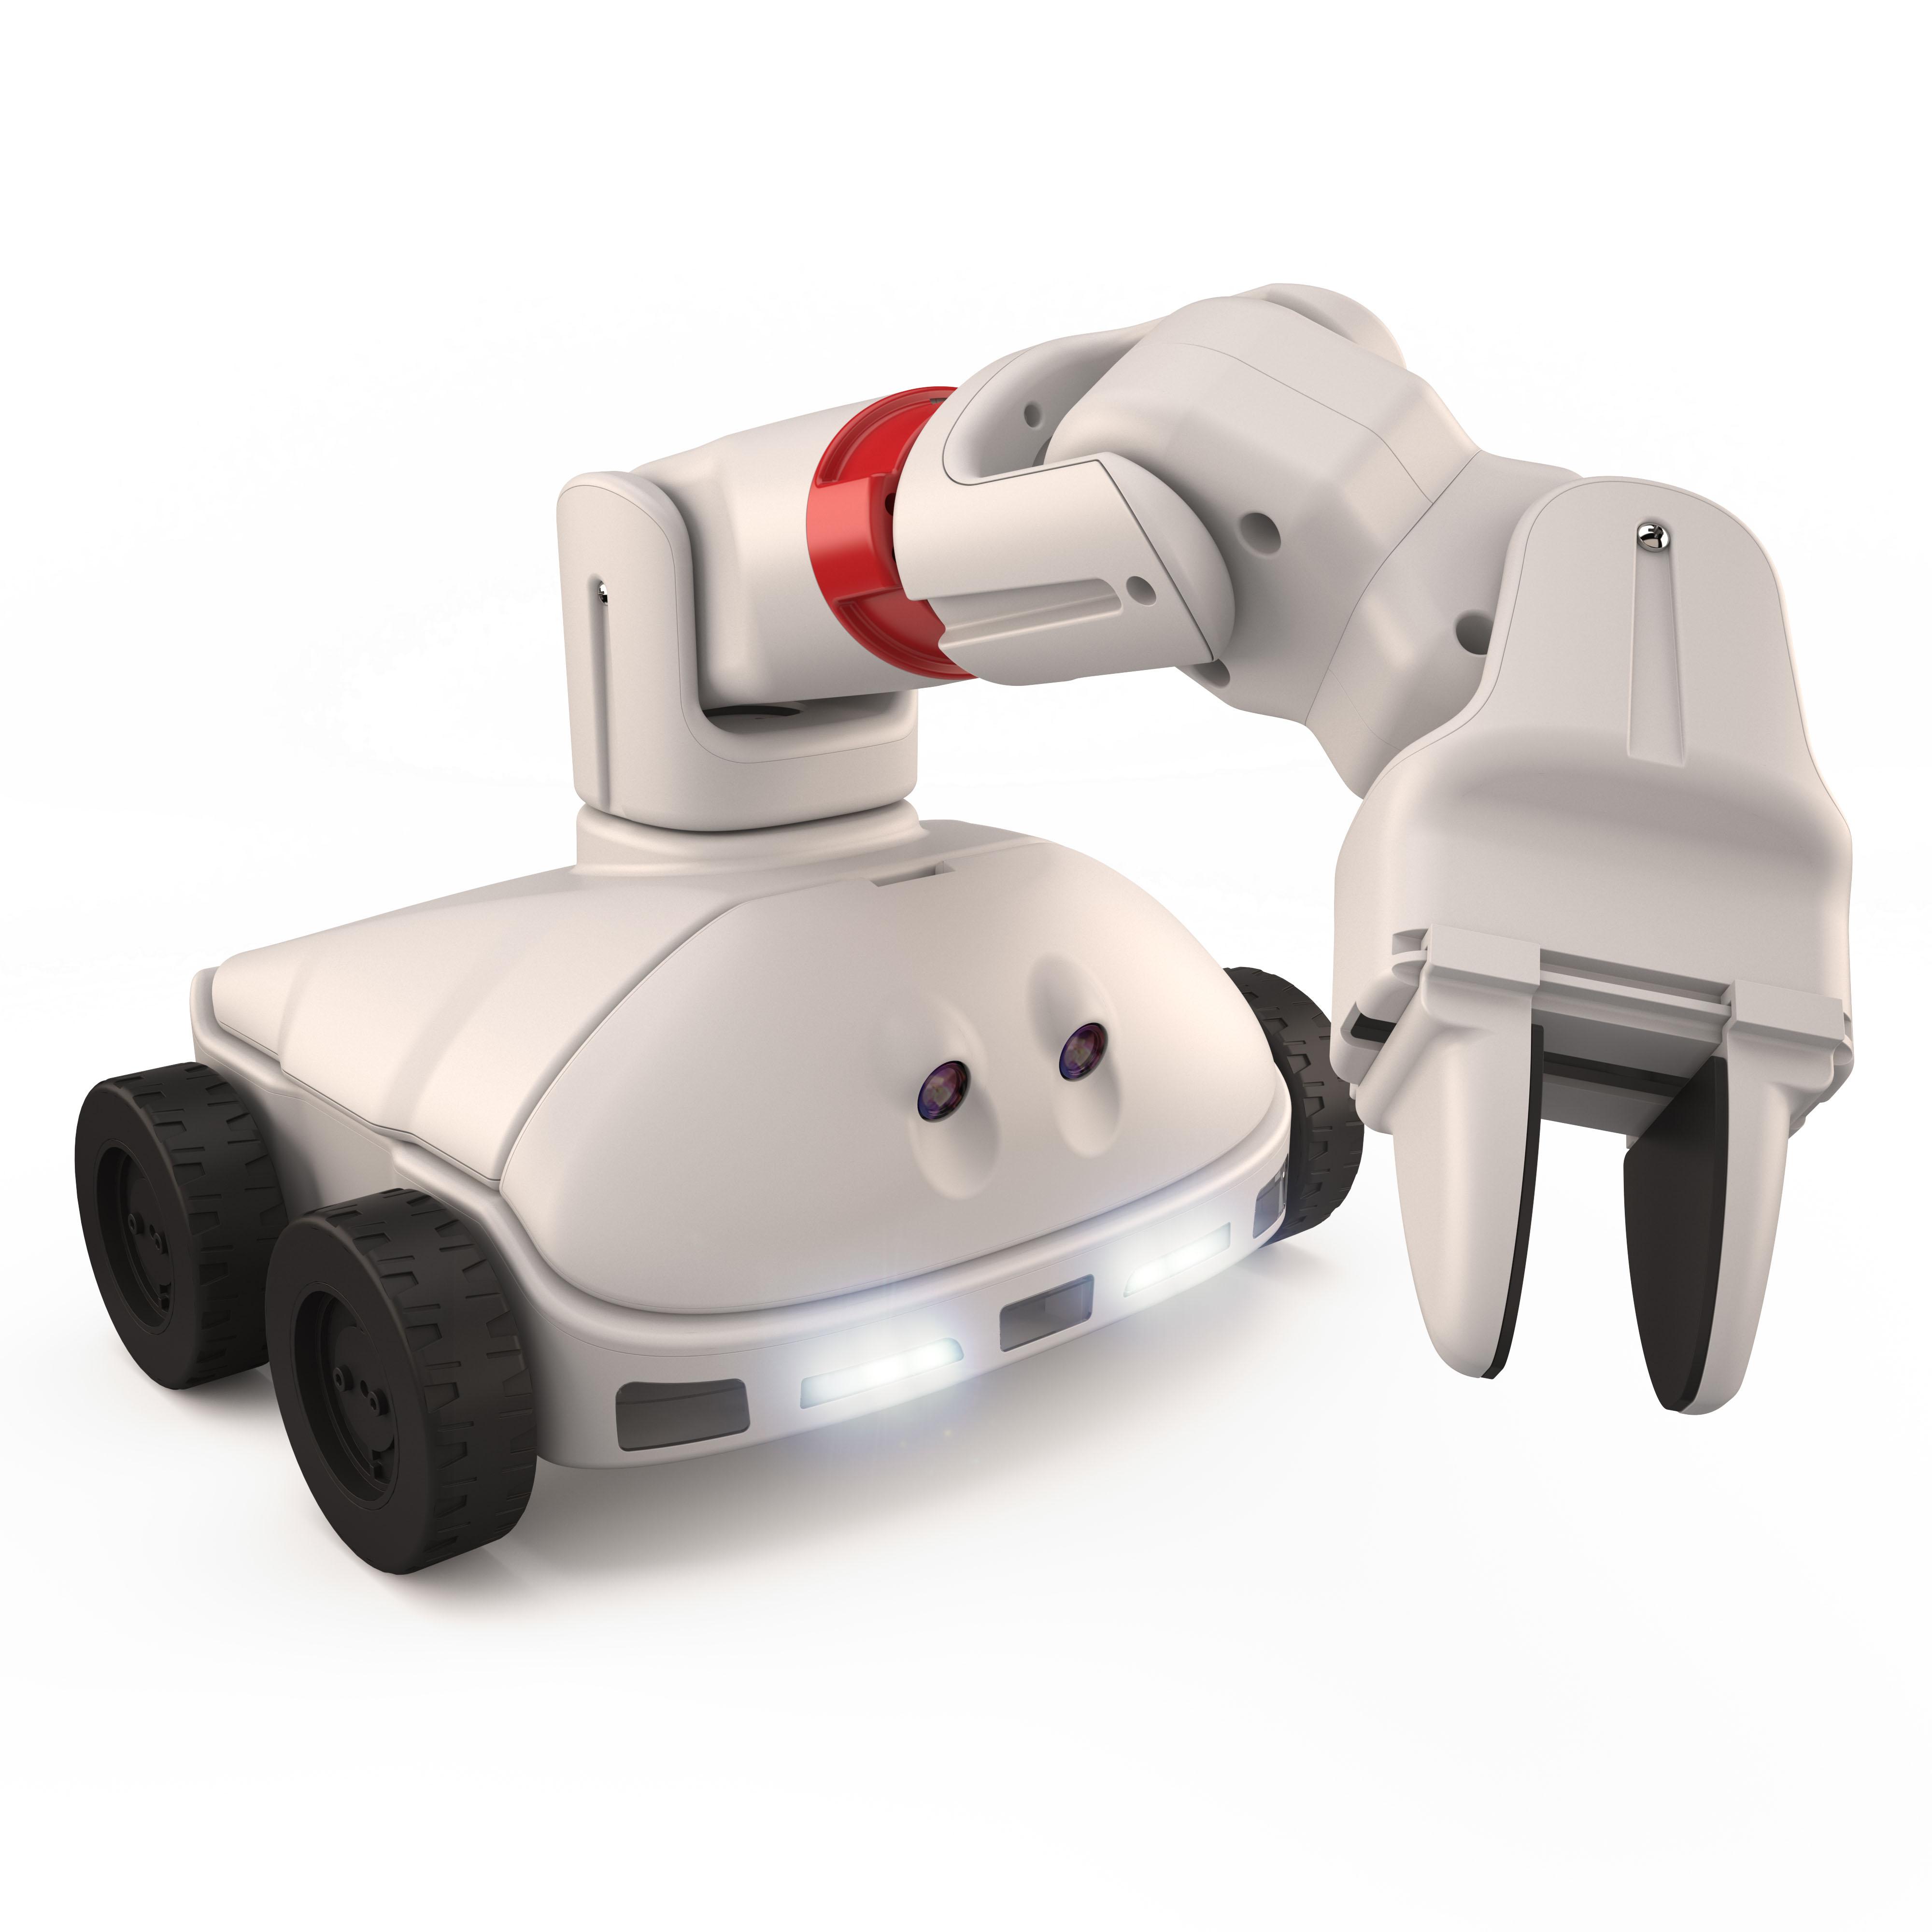 Robotic 3D product rendering